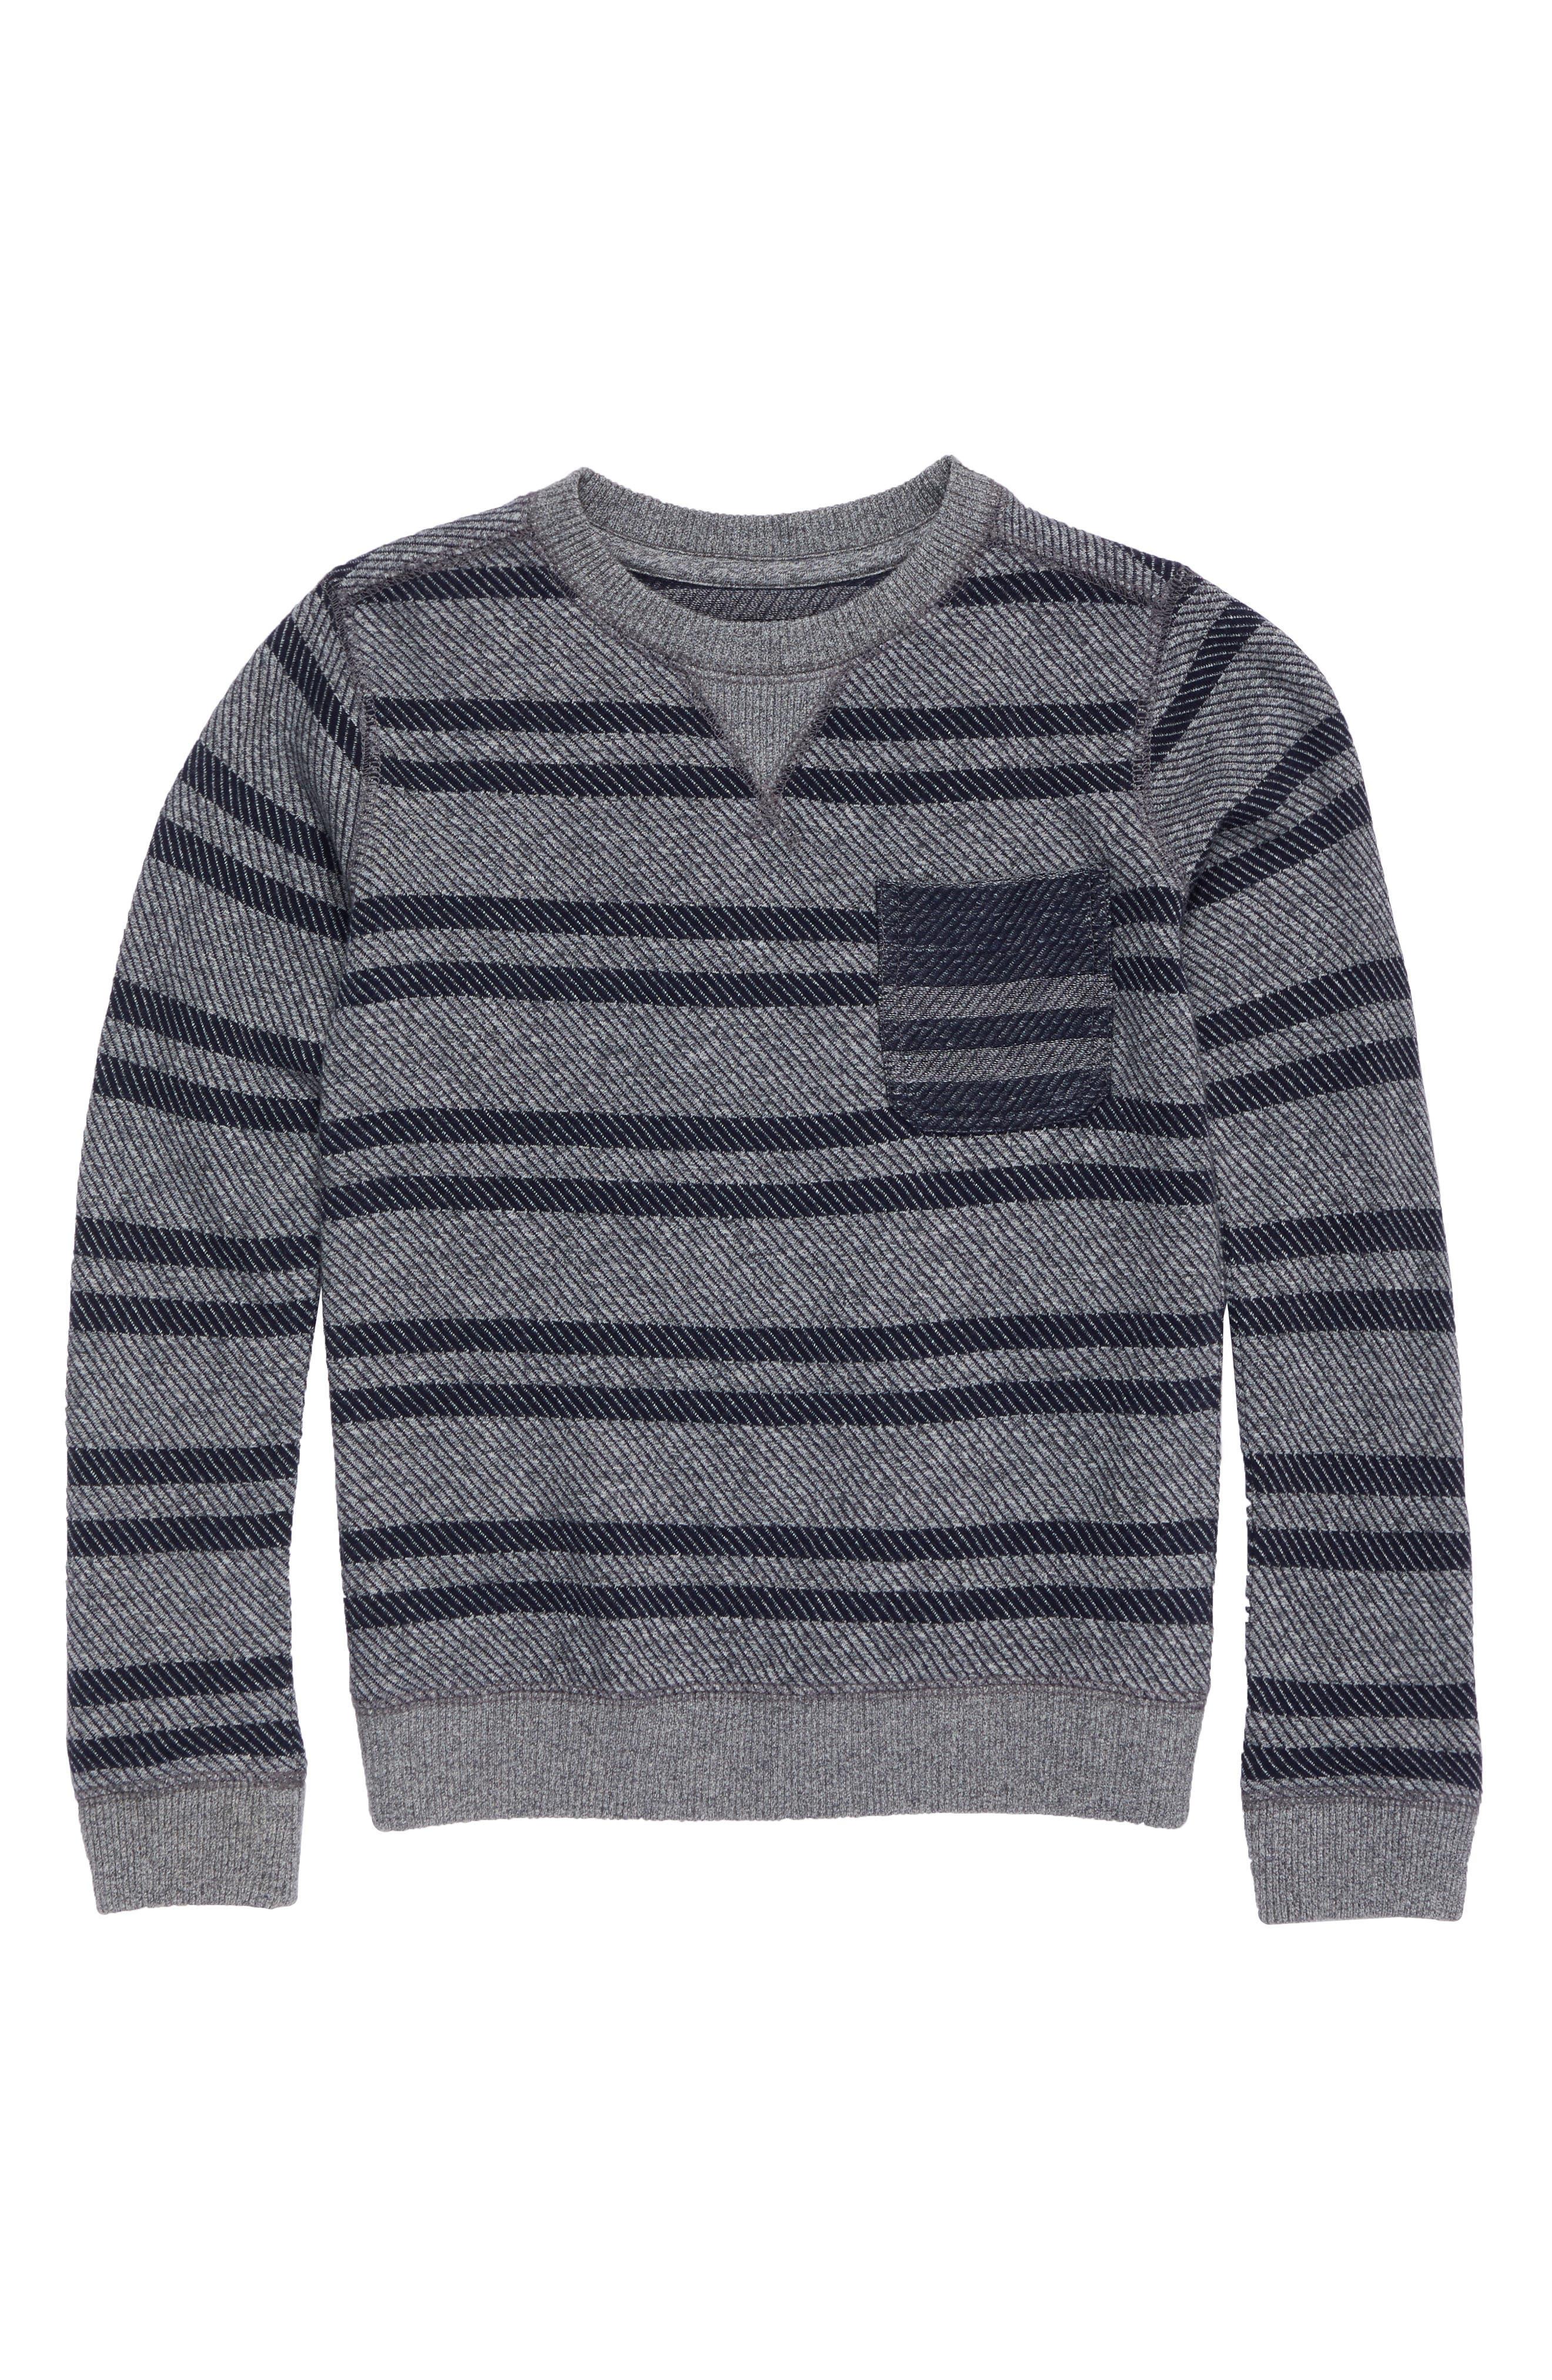 Tucker + Tate Stripe Sweatshirt (Toddler Boys & Little Boys)